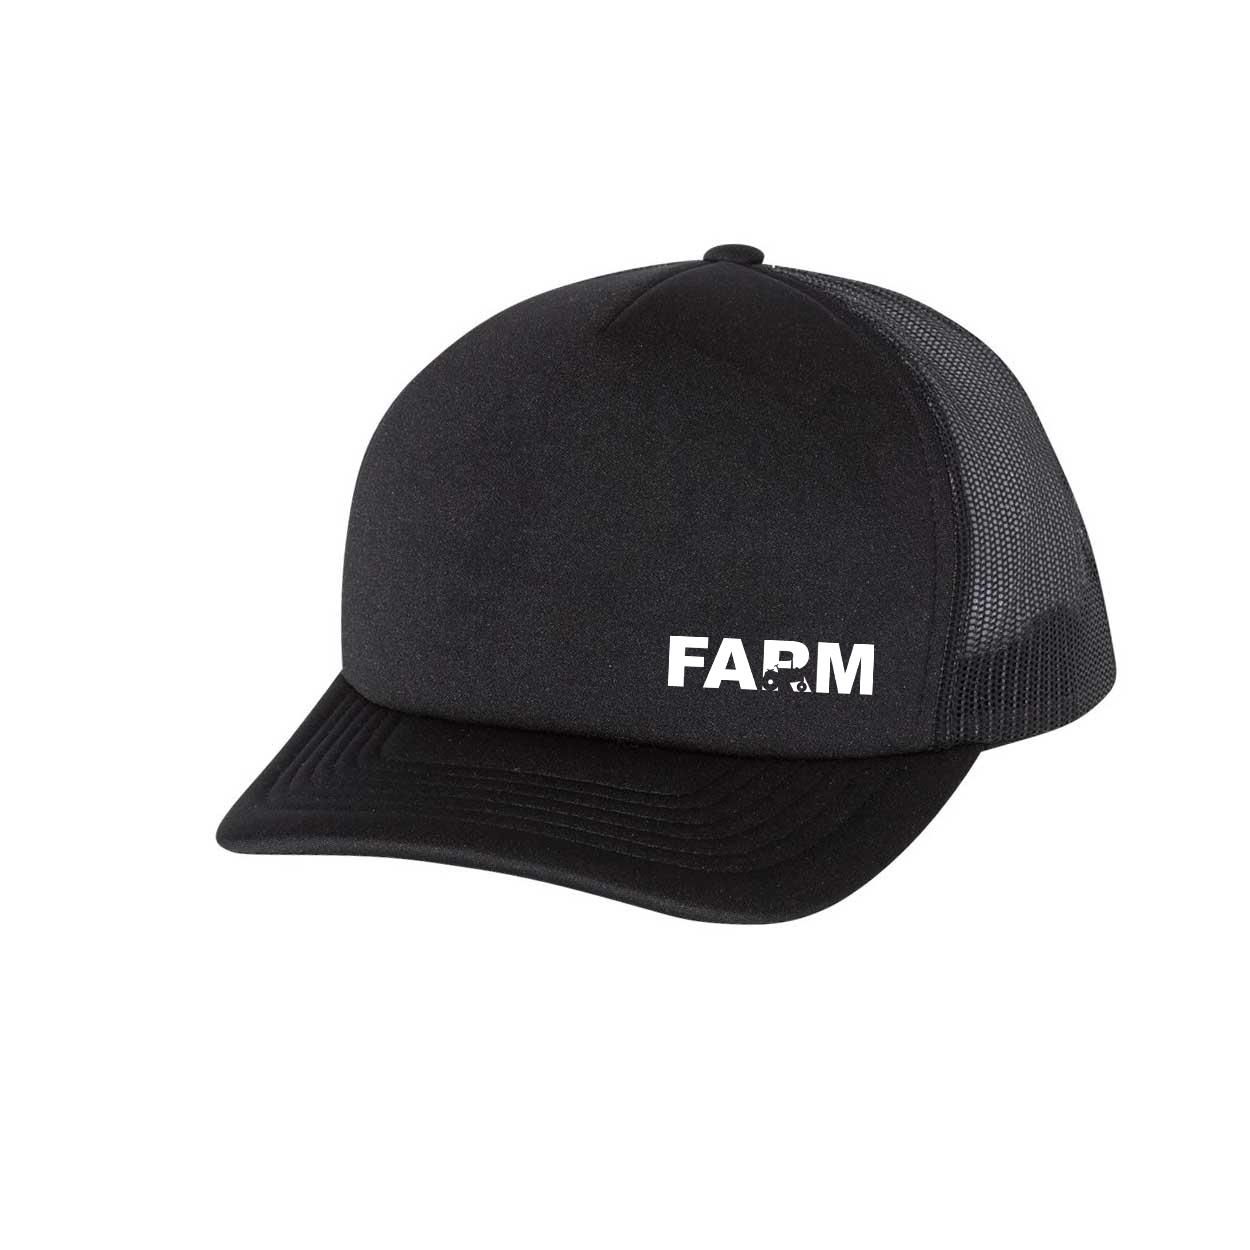 Farm Tractor Logo Night Out Premium Foam Trucker Snapback Hat Black (White Logo)